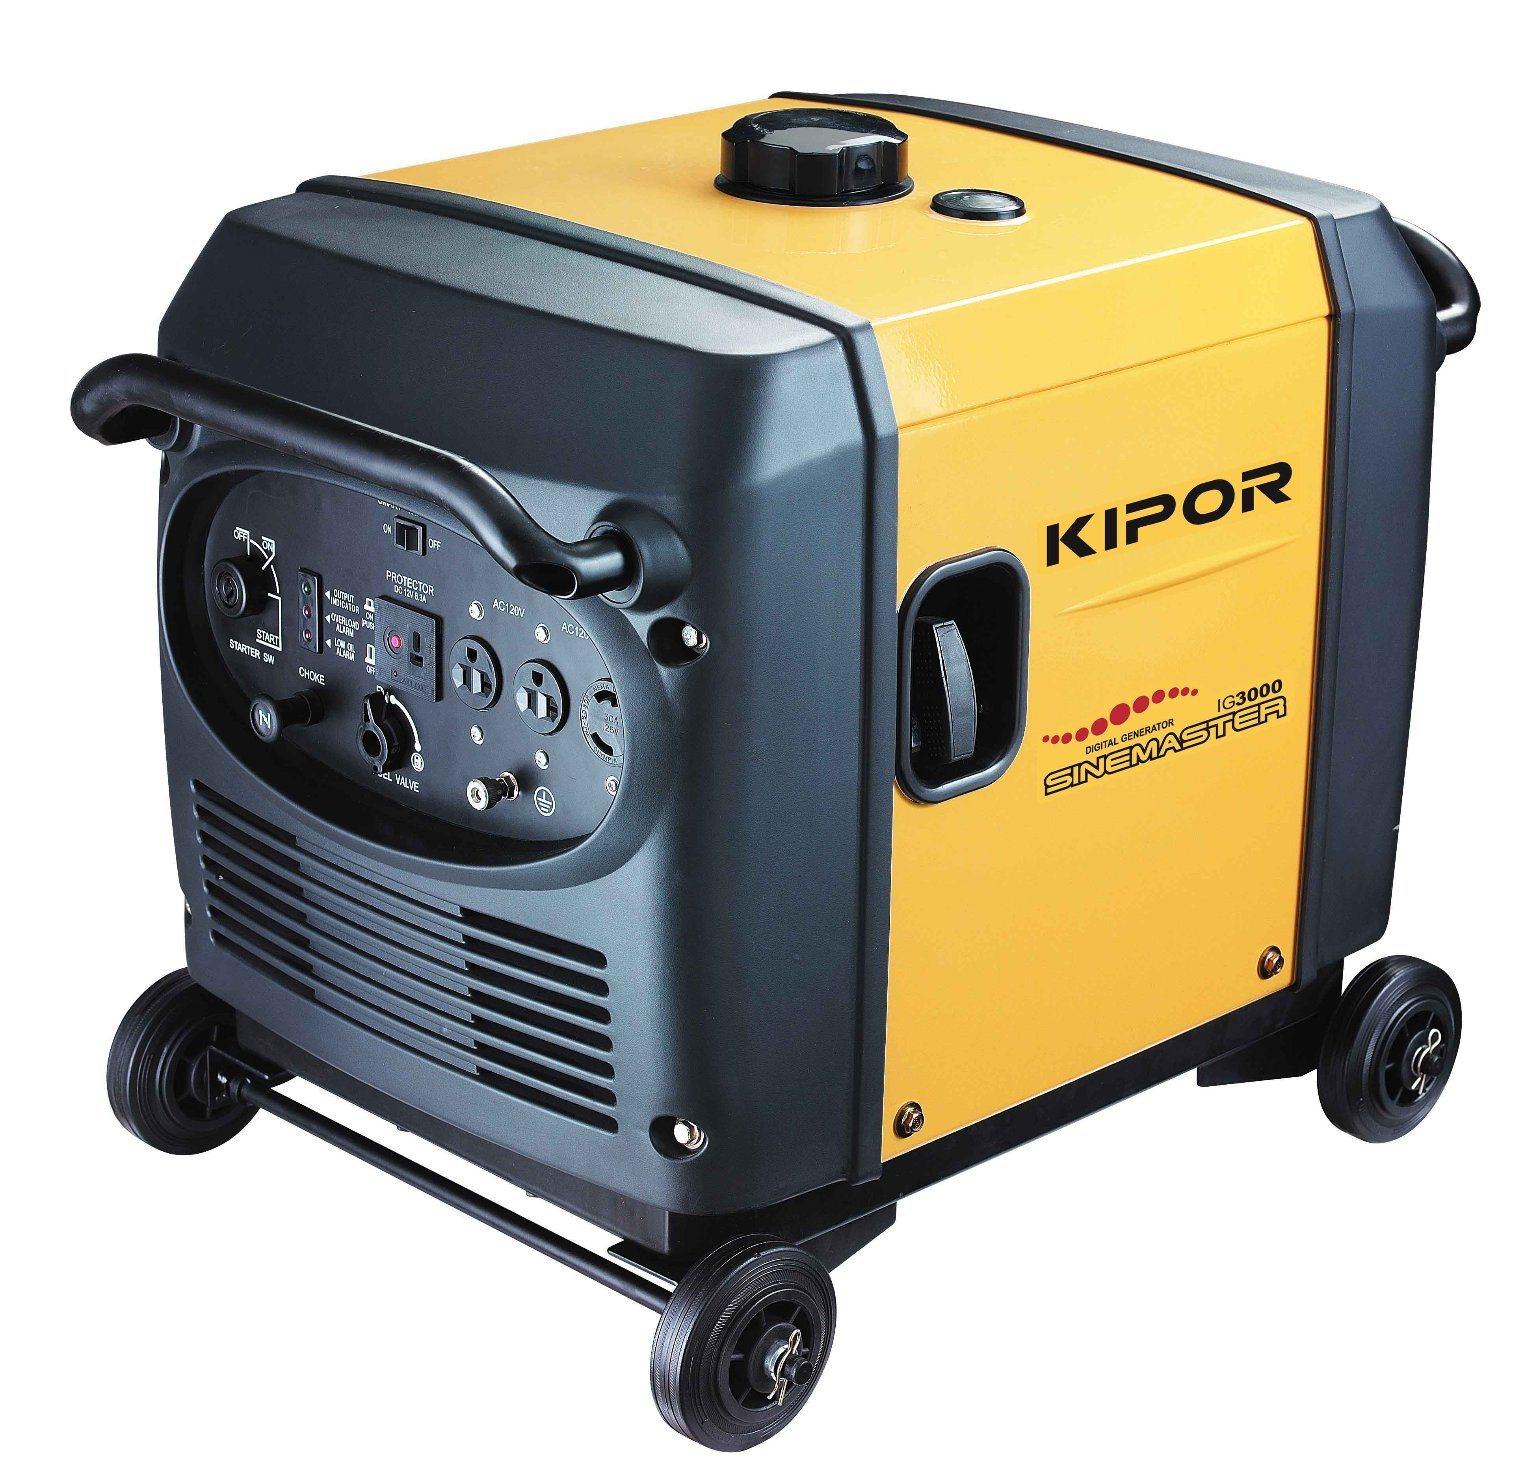 China Kipor Ig3000 Ig3000p Gasoline Generator 3kw for Home Use